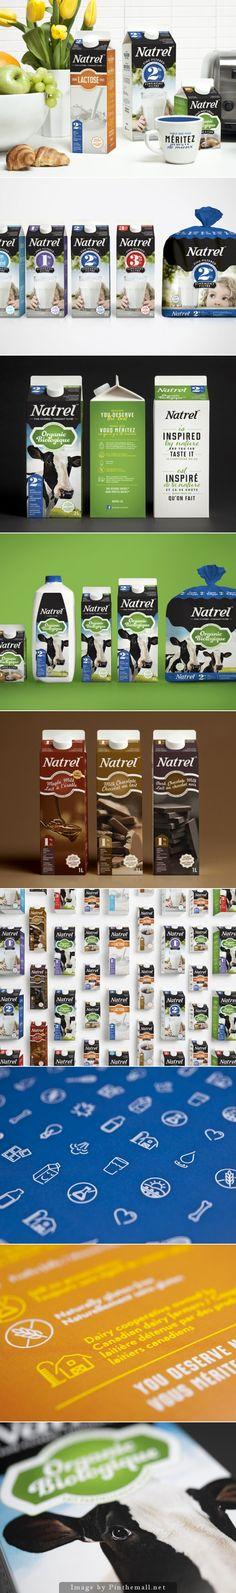 Naturel #Milk #packaging by lg2 boutique - http://www.packagingoftheworld.com/2014/11/naturel-milk.html